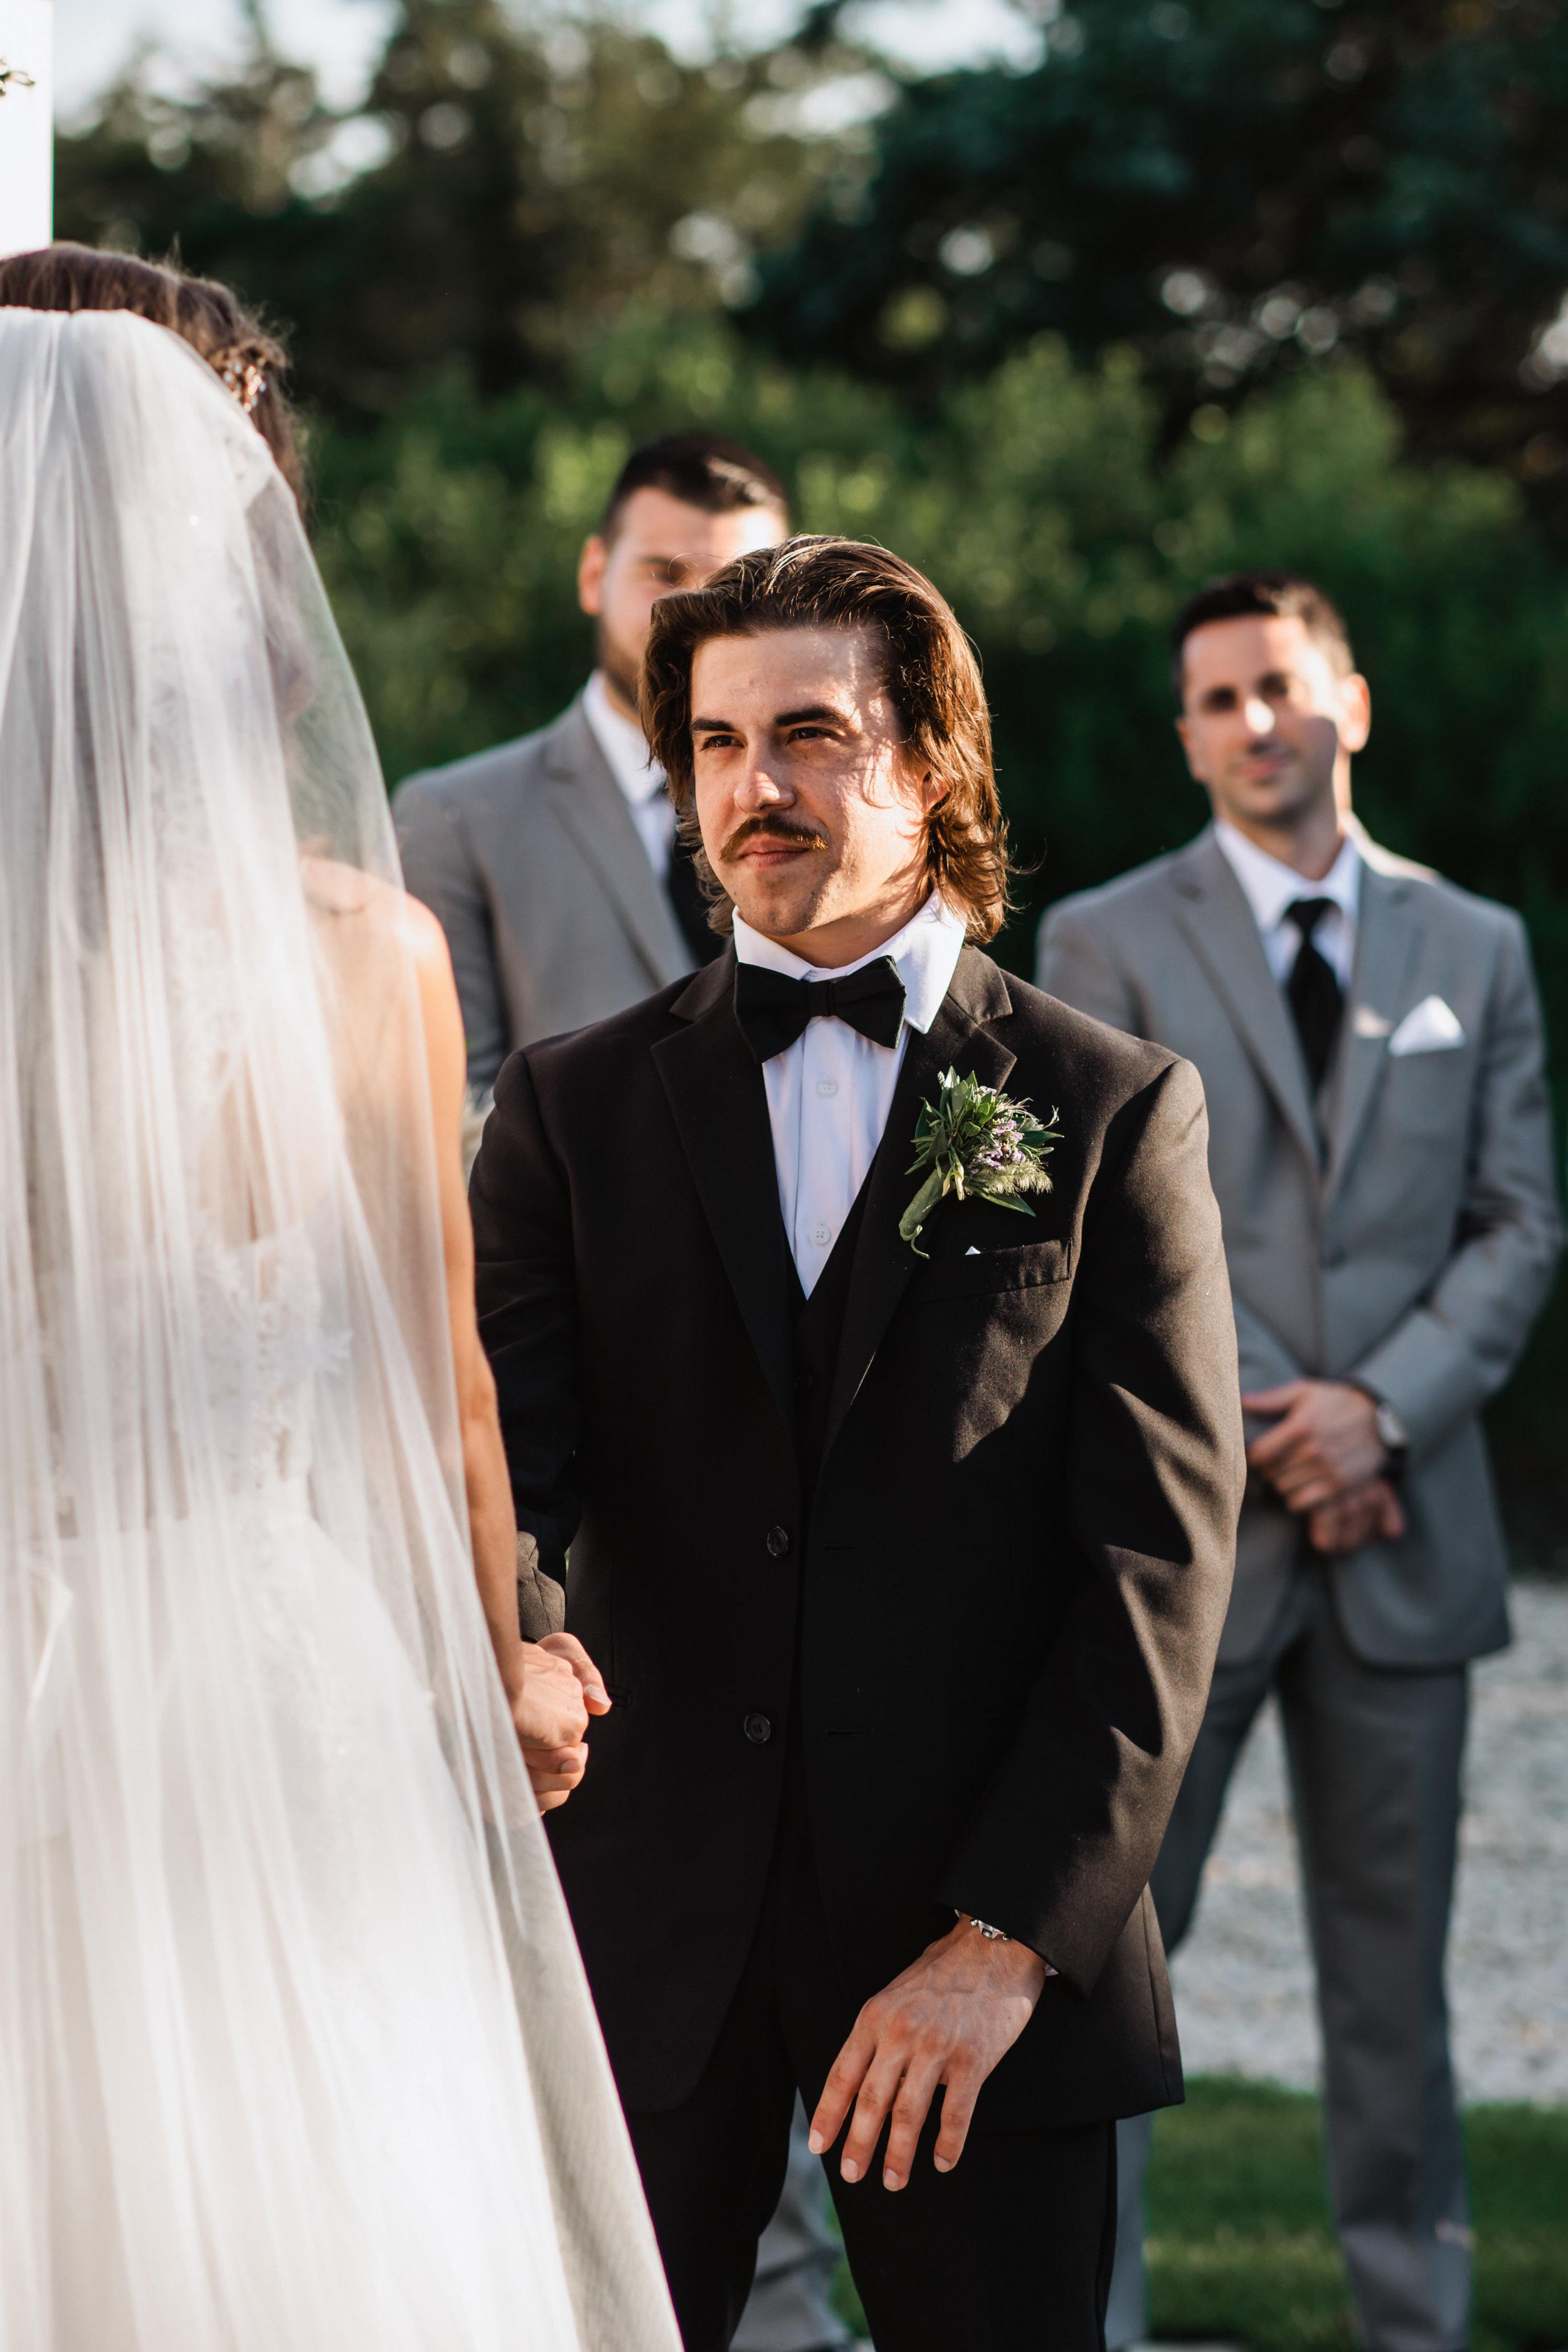 JJP_Emily&Joey_Summer_Old Field Club Wedding_41.jpg